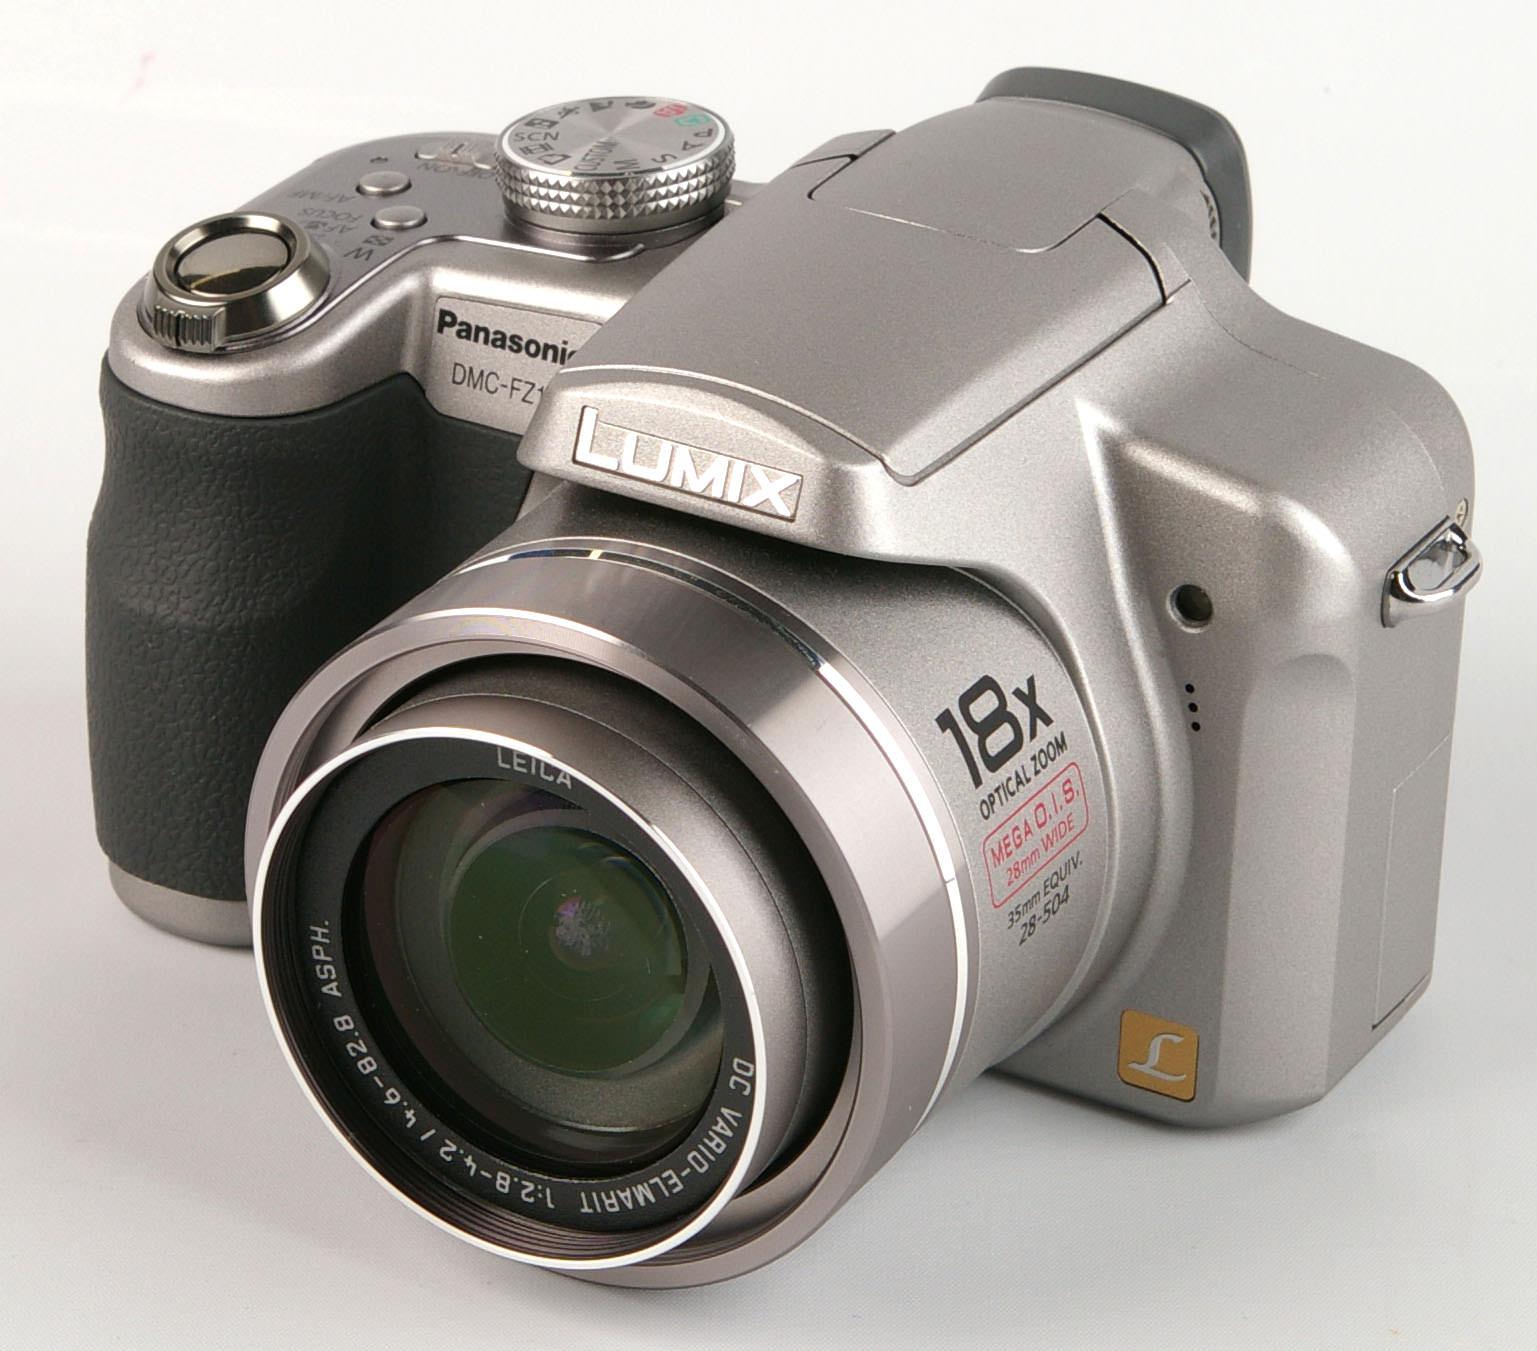 panasonic dmc fz18 digital camera review rh ephotozine com Panasonic Lumix DMC FZ18 Manual Dmc- Fz20